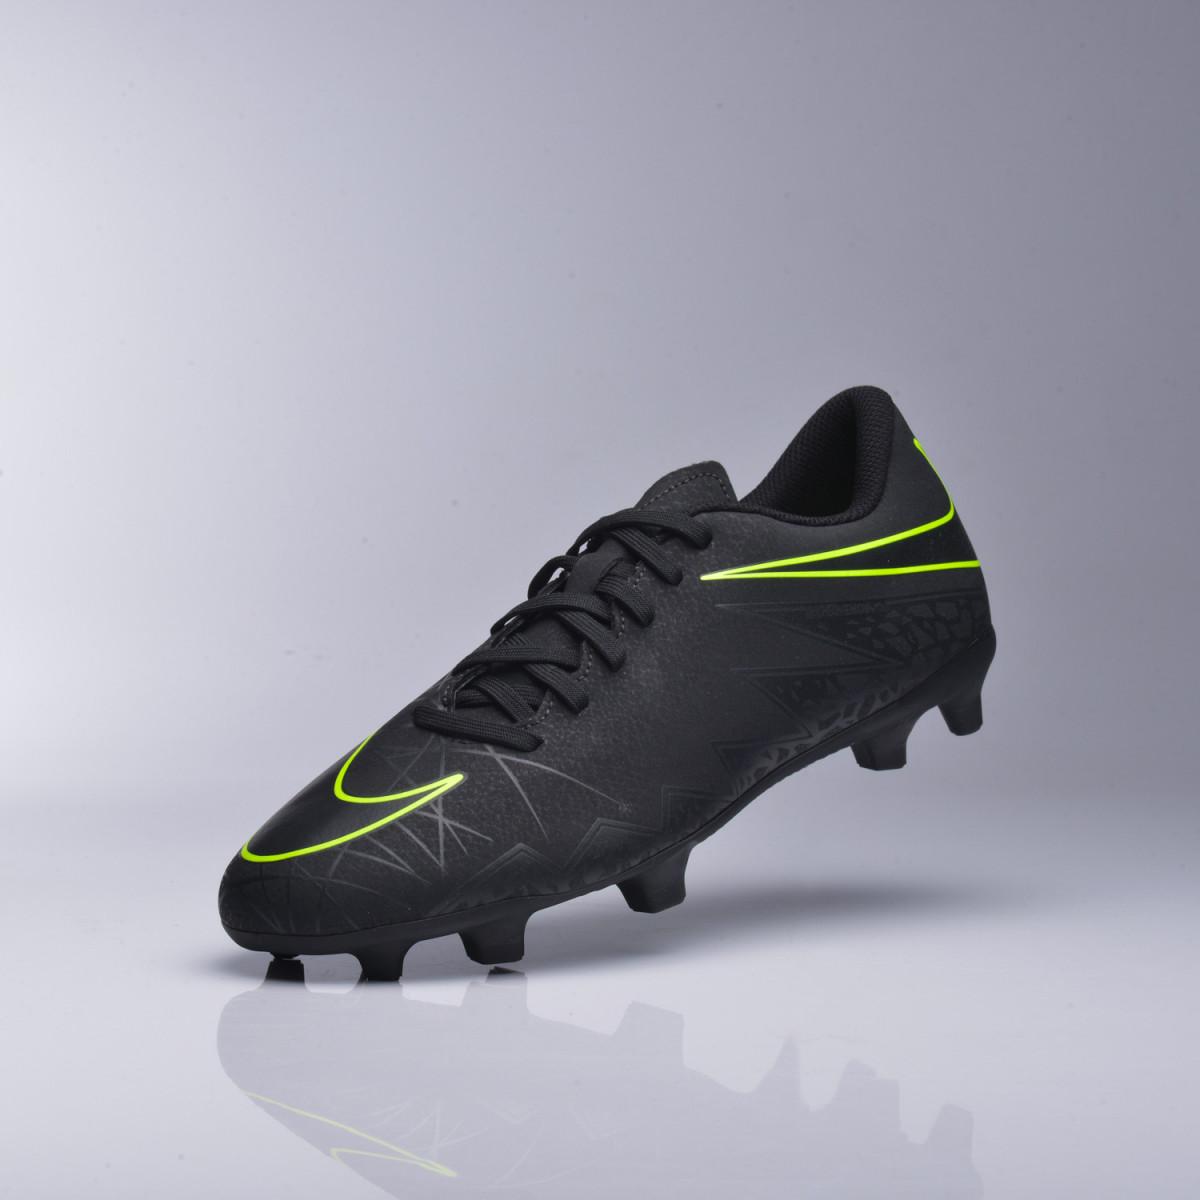 52541c17c9539 Botines Nike Hypervenom Phade II Fg - Ofertas - Colegial